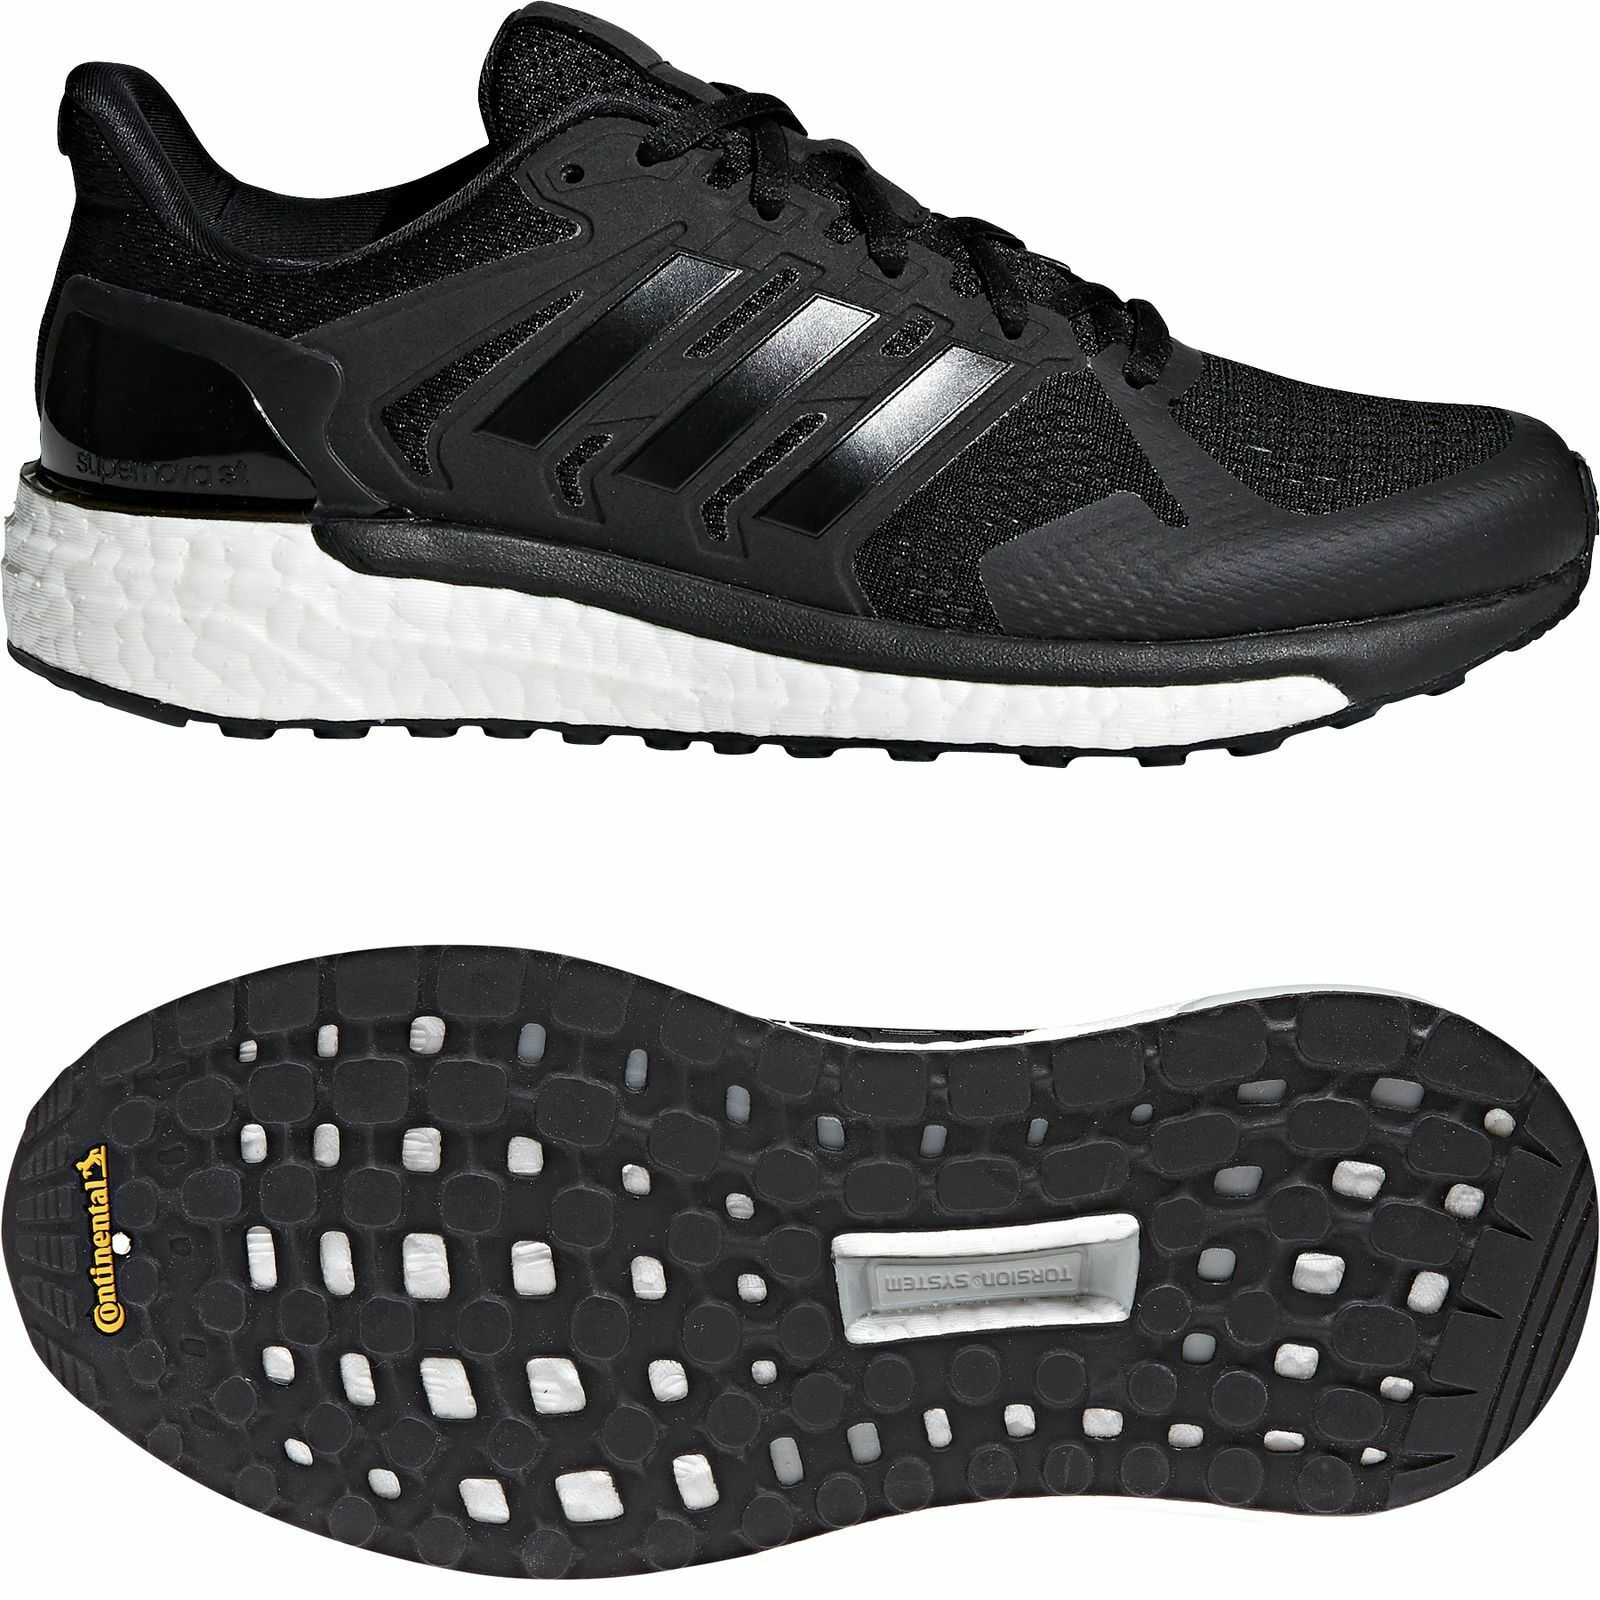 Adidas Supernova ST Boost Women's Running Training Shoes Black CG4036